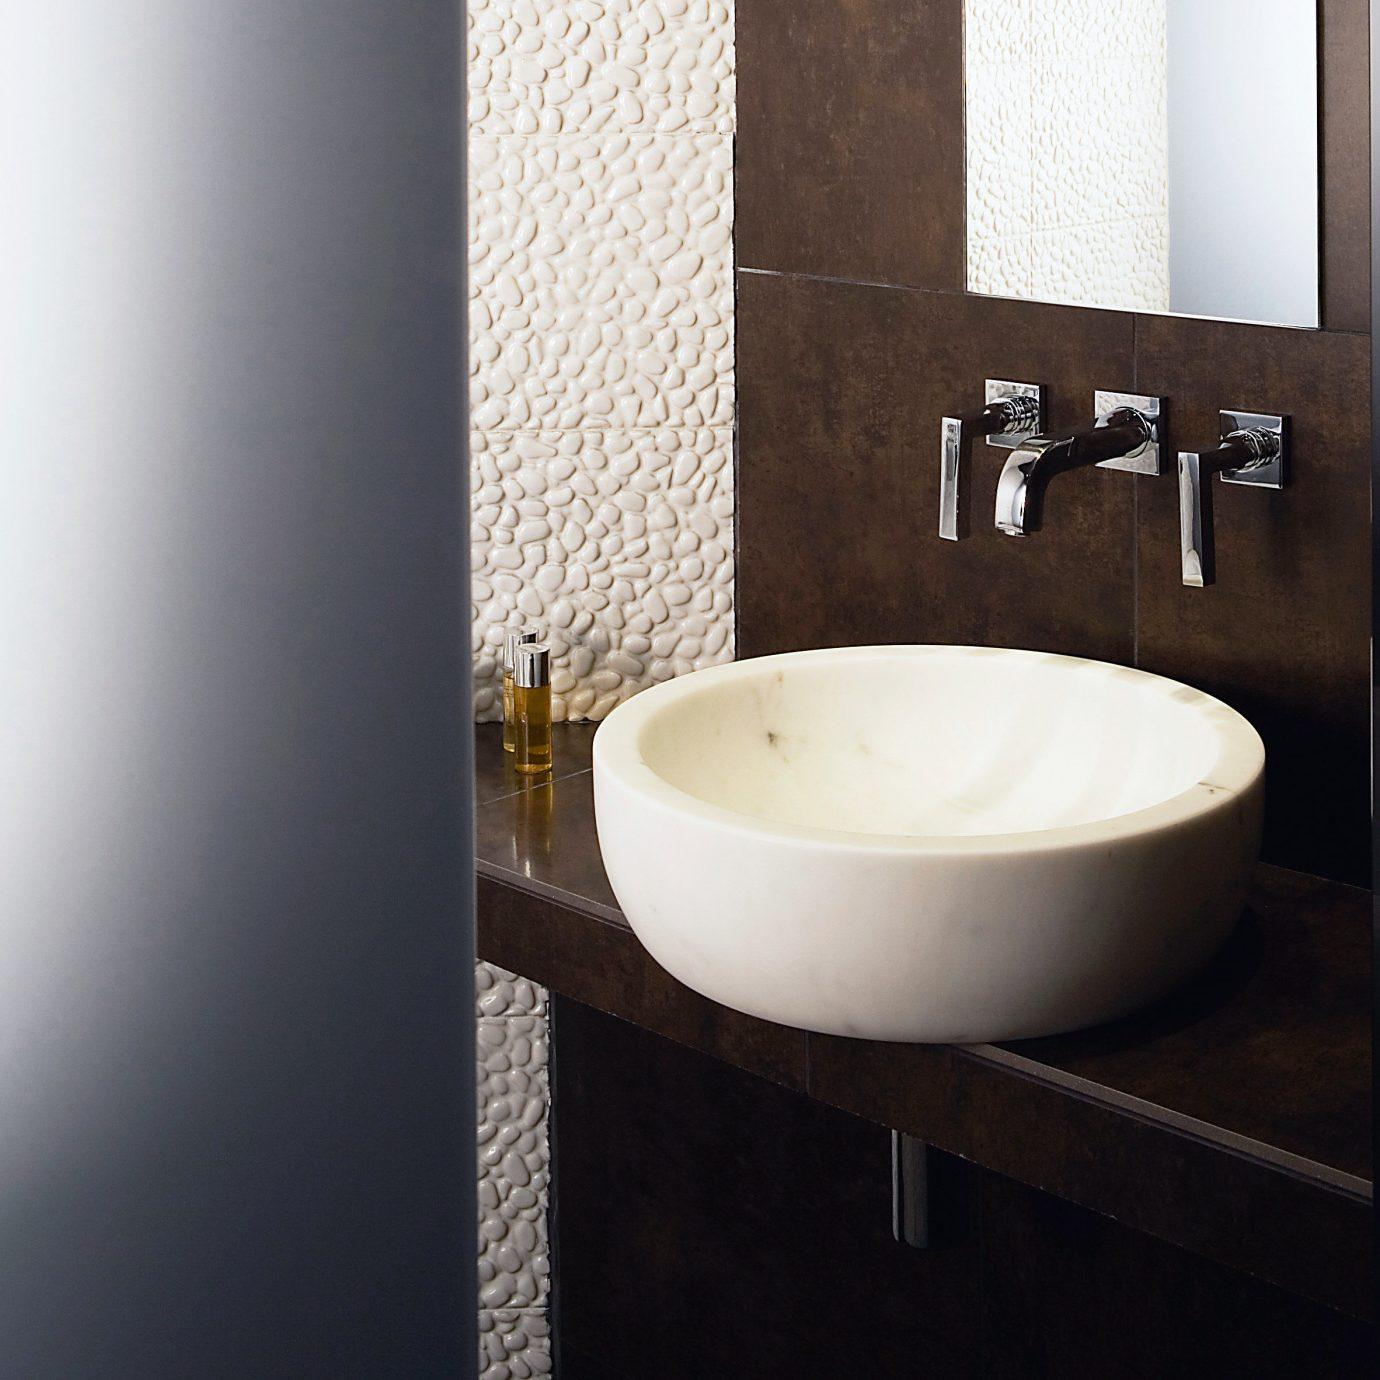 Bath Luxury Modern bathroom plumbing fixture sink bidet bathtub lighting ceramic toilet flooring